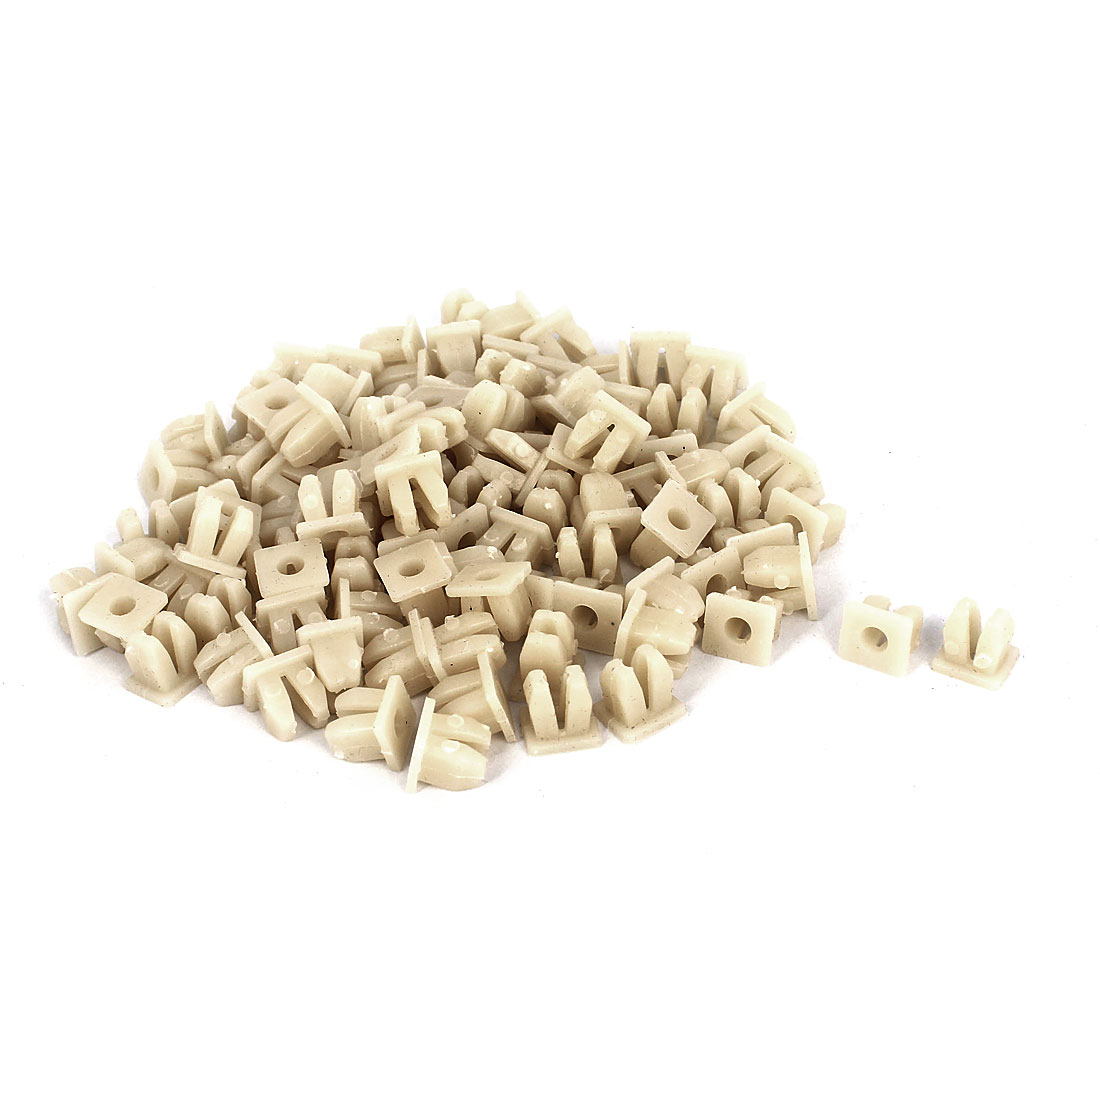 100 Pcs White Plastic Rivet Trim Fastener Moulding Clips 5mm x 9mm x 12mm